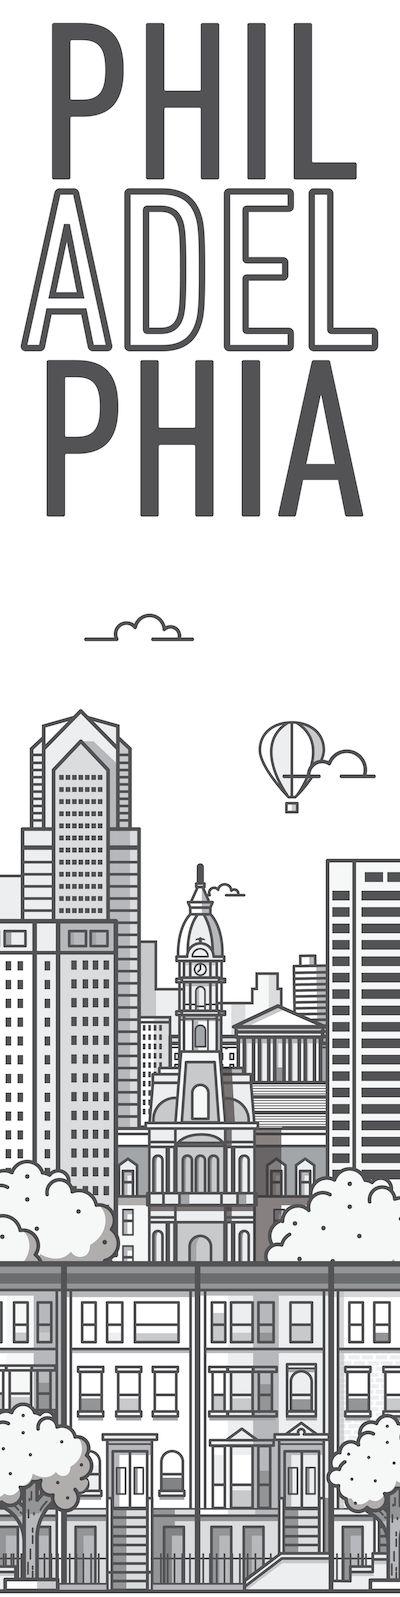 philadelphia city illustration